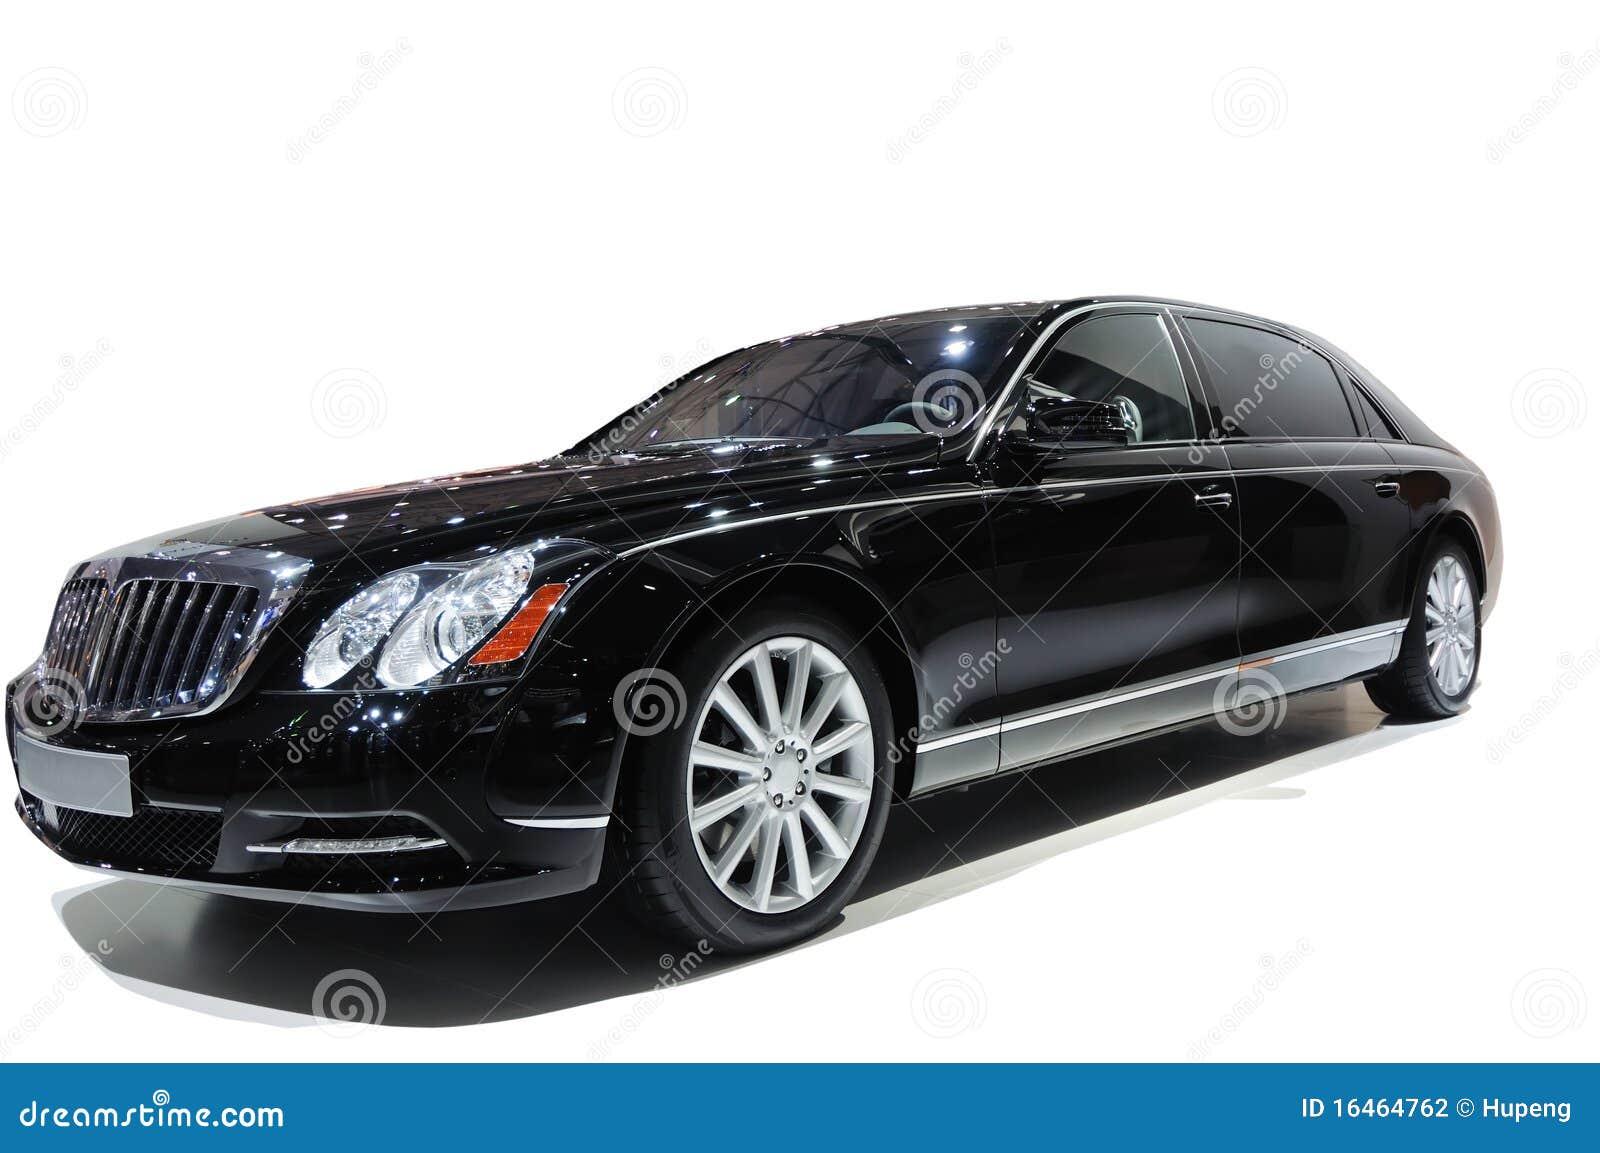 Black Luxury Vehicles: Luxury Black Car Stock Photography